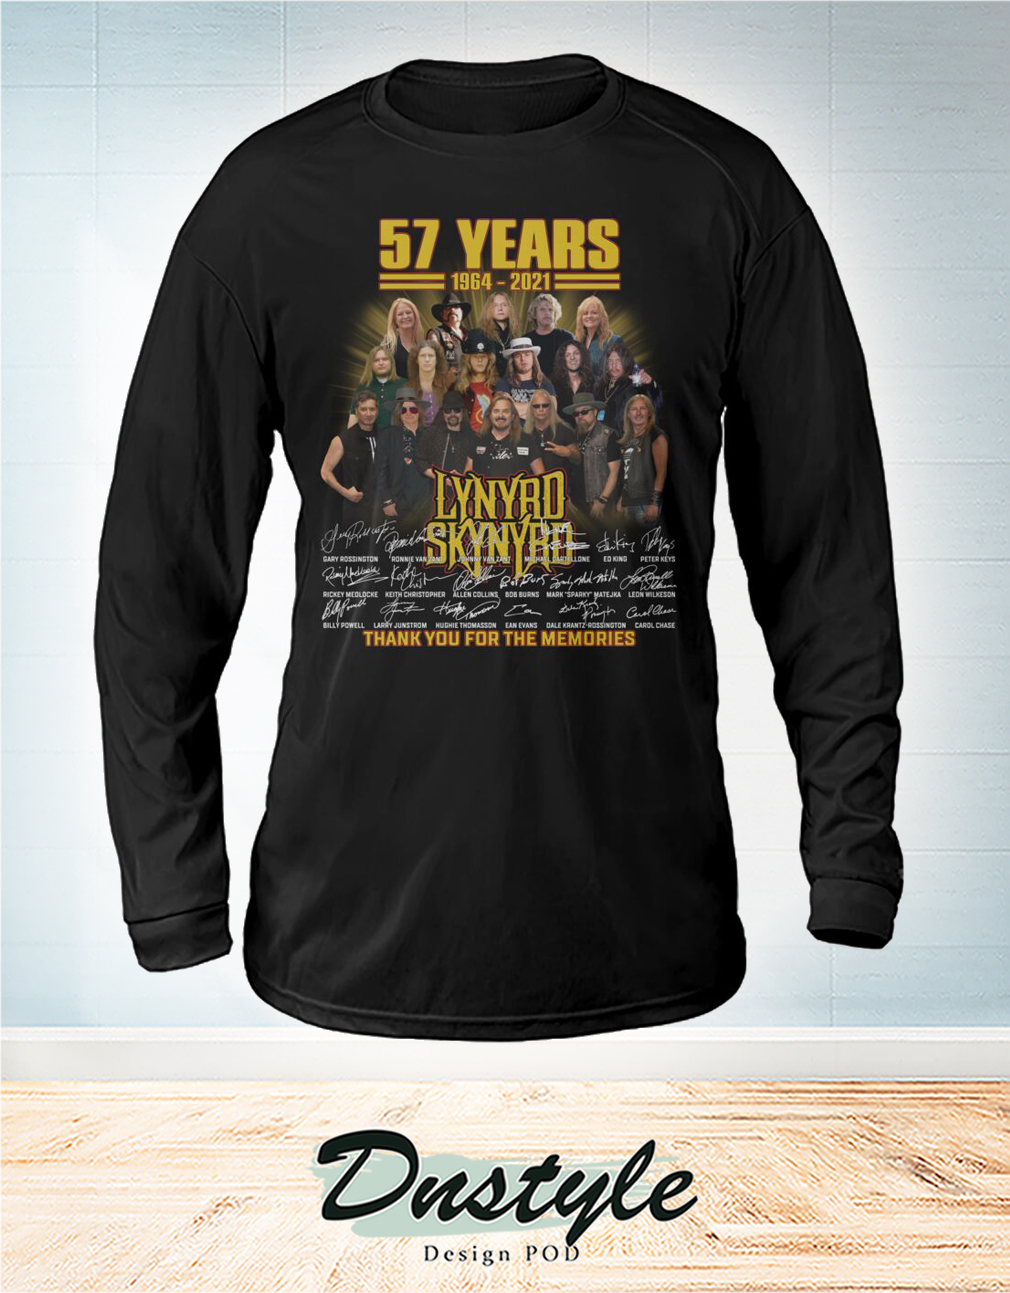 Lynyrd Skynyrd 57 years signature thank you for the memories sweatshirt